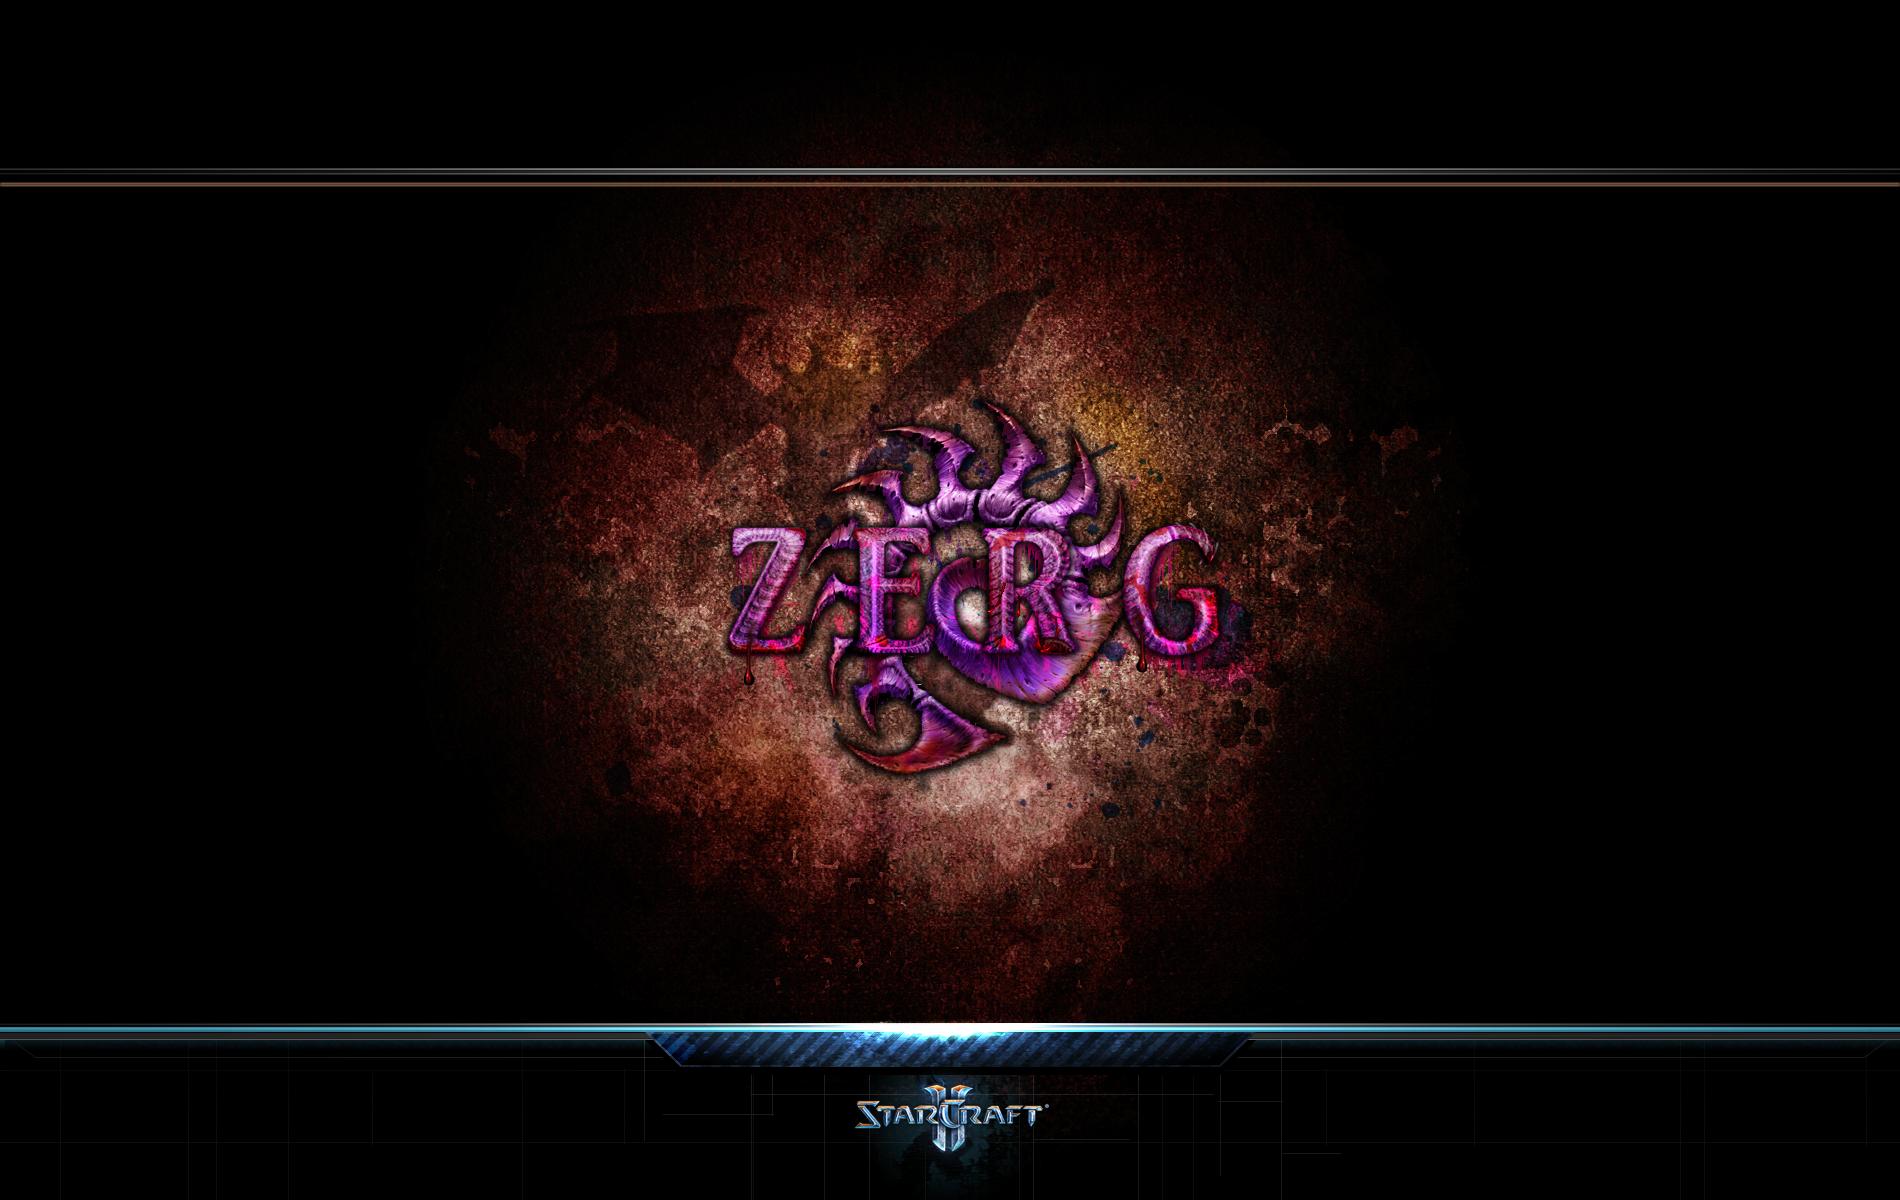 Starcraft ii zerg wp by easydisplayname on deviantart - Zerg wallpaper ...